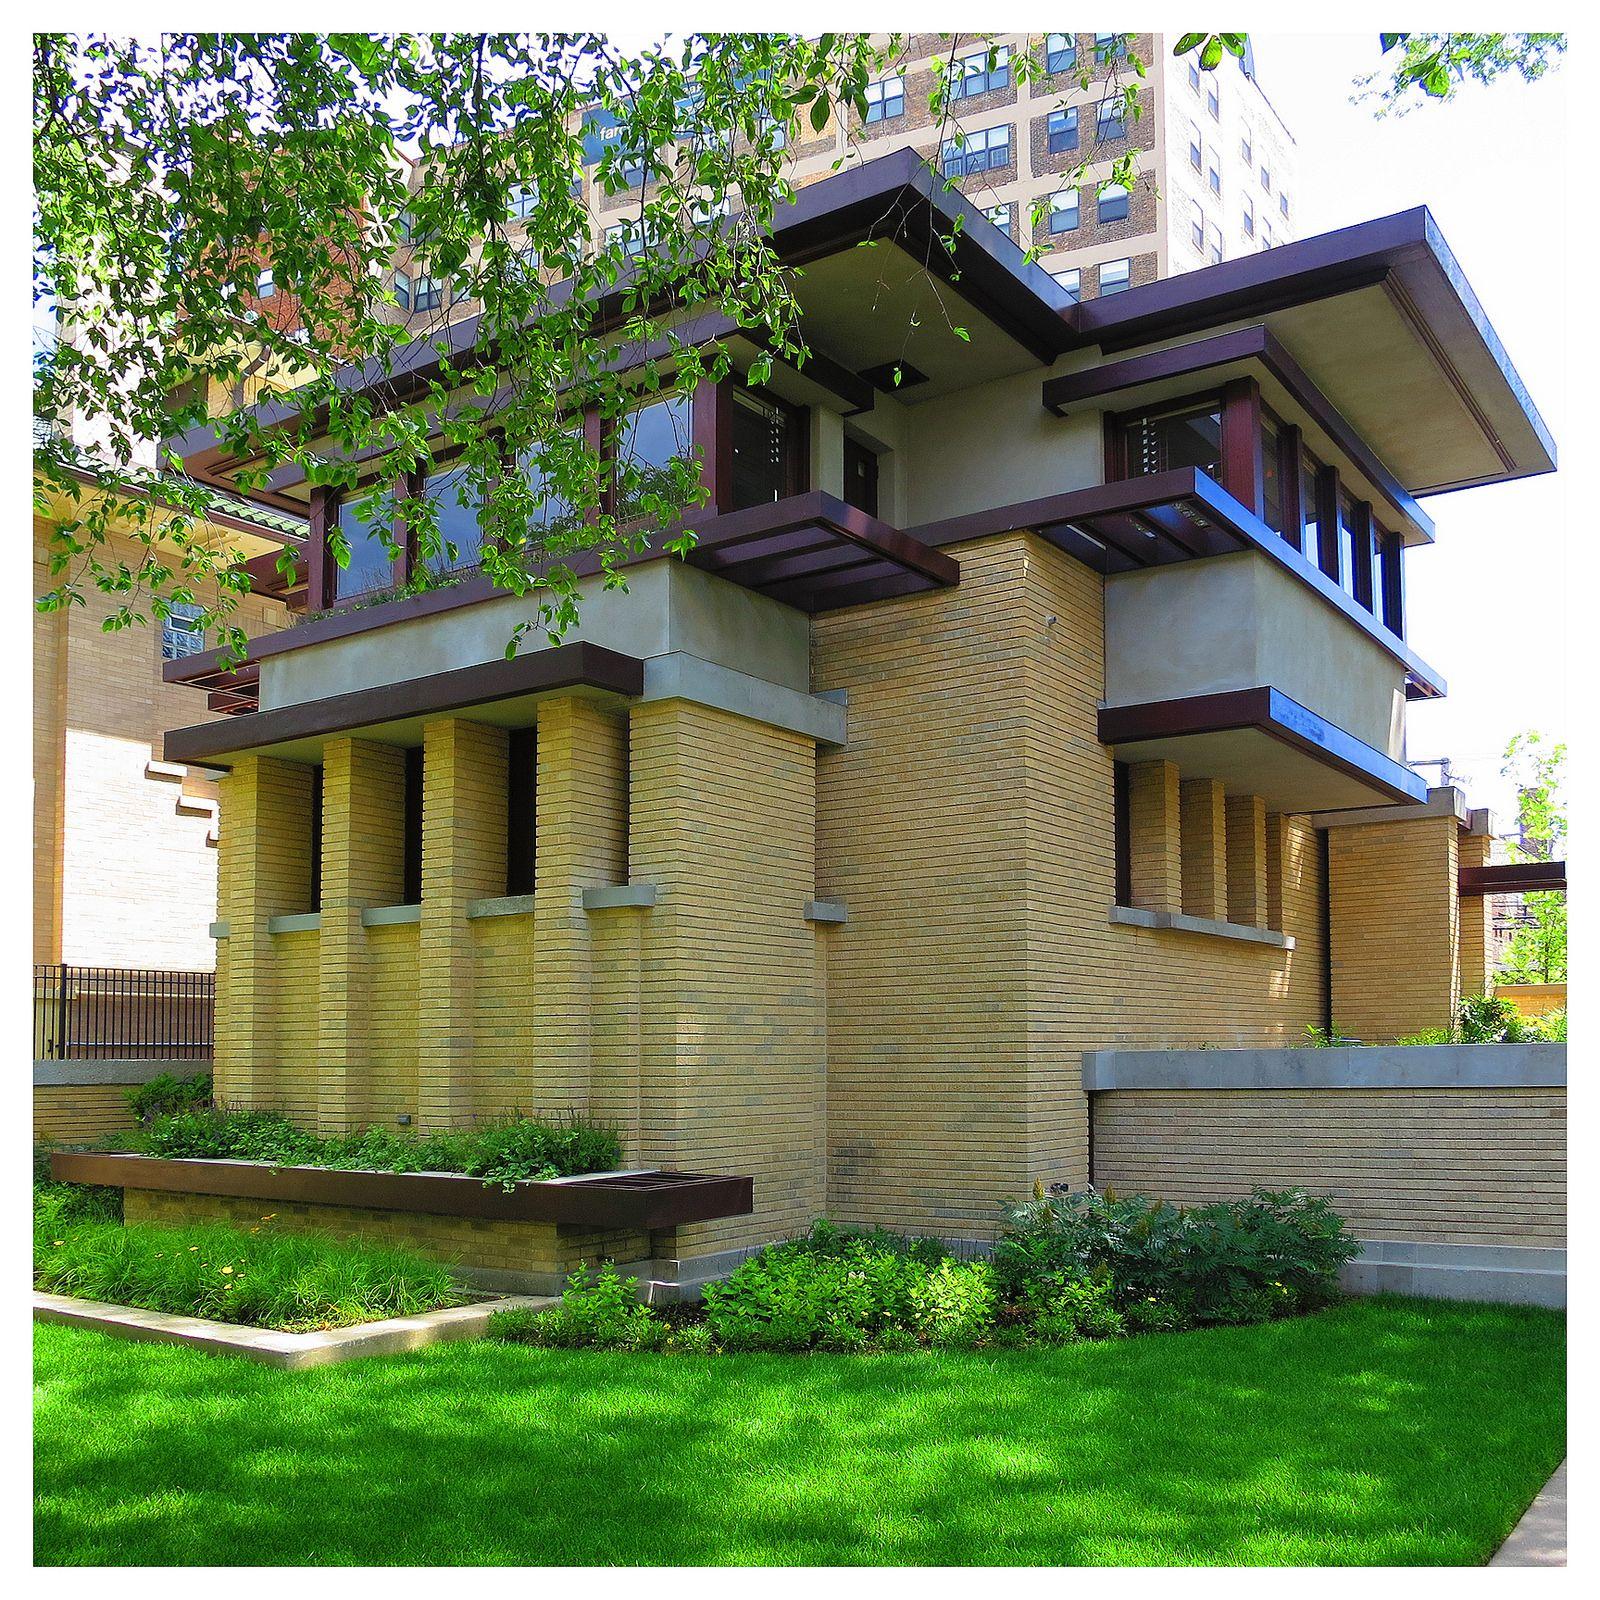 Img_9529 emil bach house prairie style houses famous